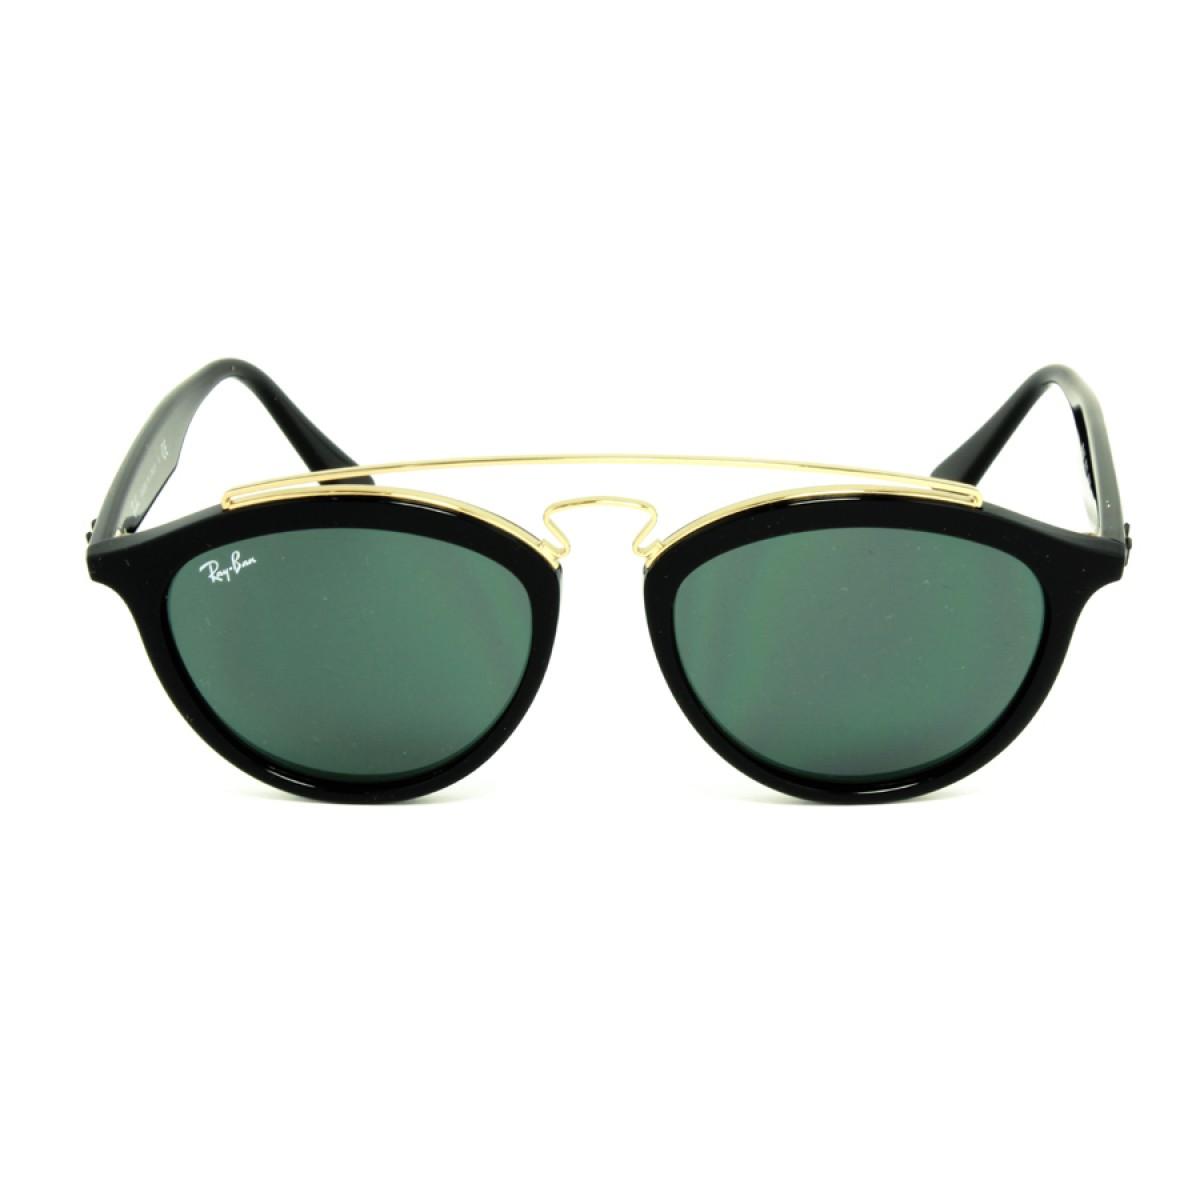 5e92372653 Ray Ban Gatsby II Green Classic Unisex Sunglasses RB4257-601 71-50 ...